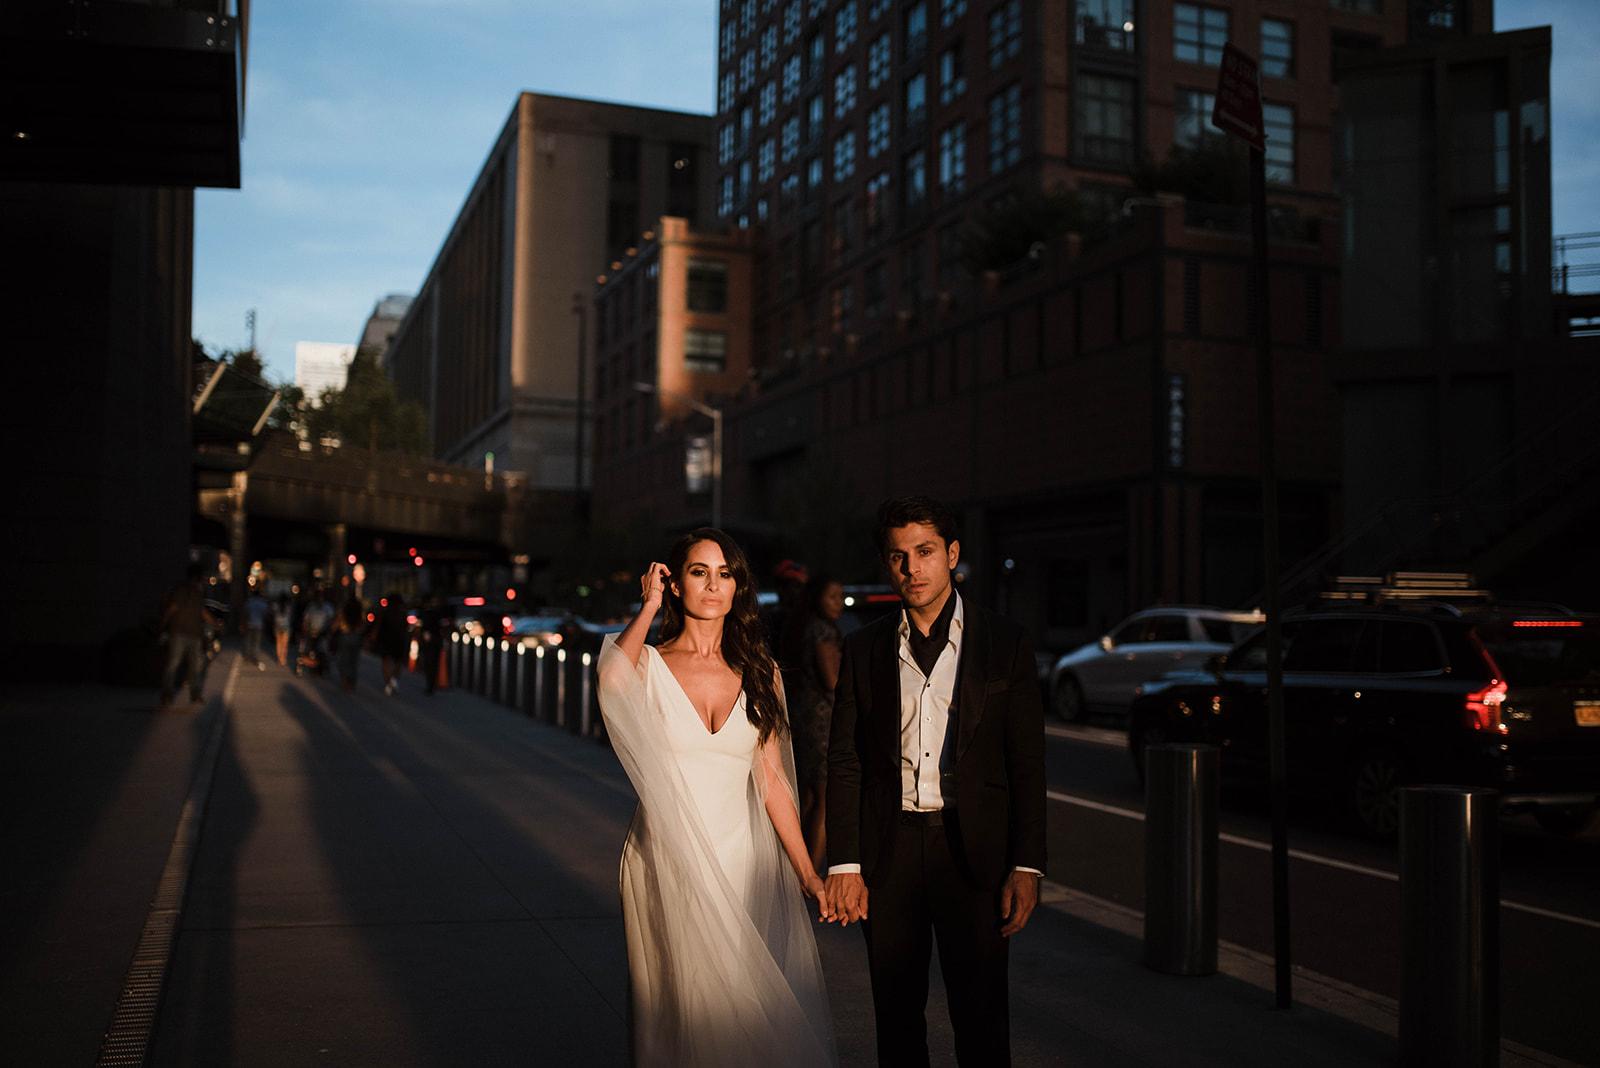 Jenna___Austin_Wedding_Day-_LHP-935.jpg